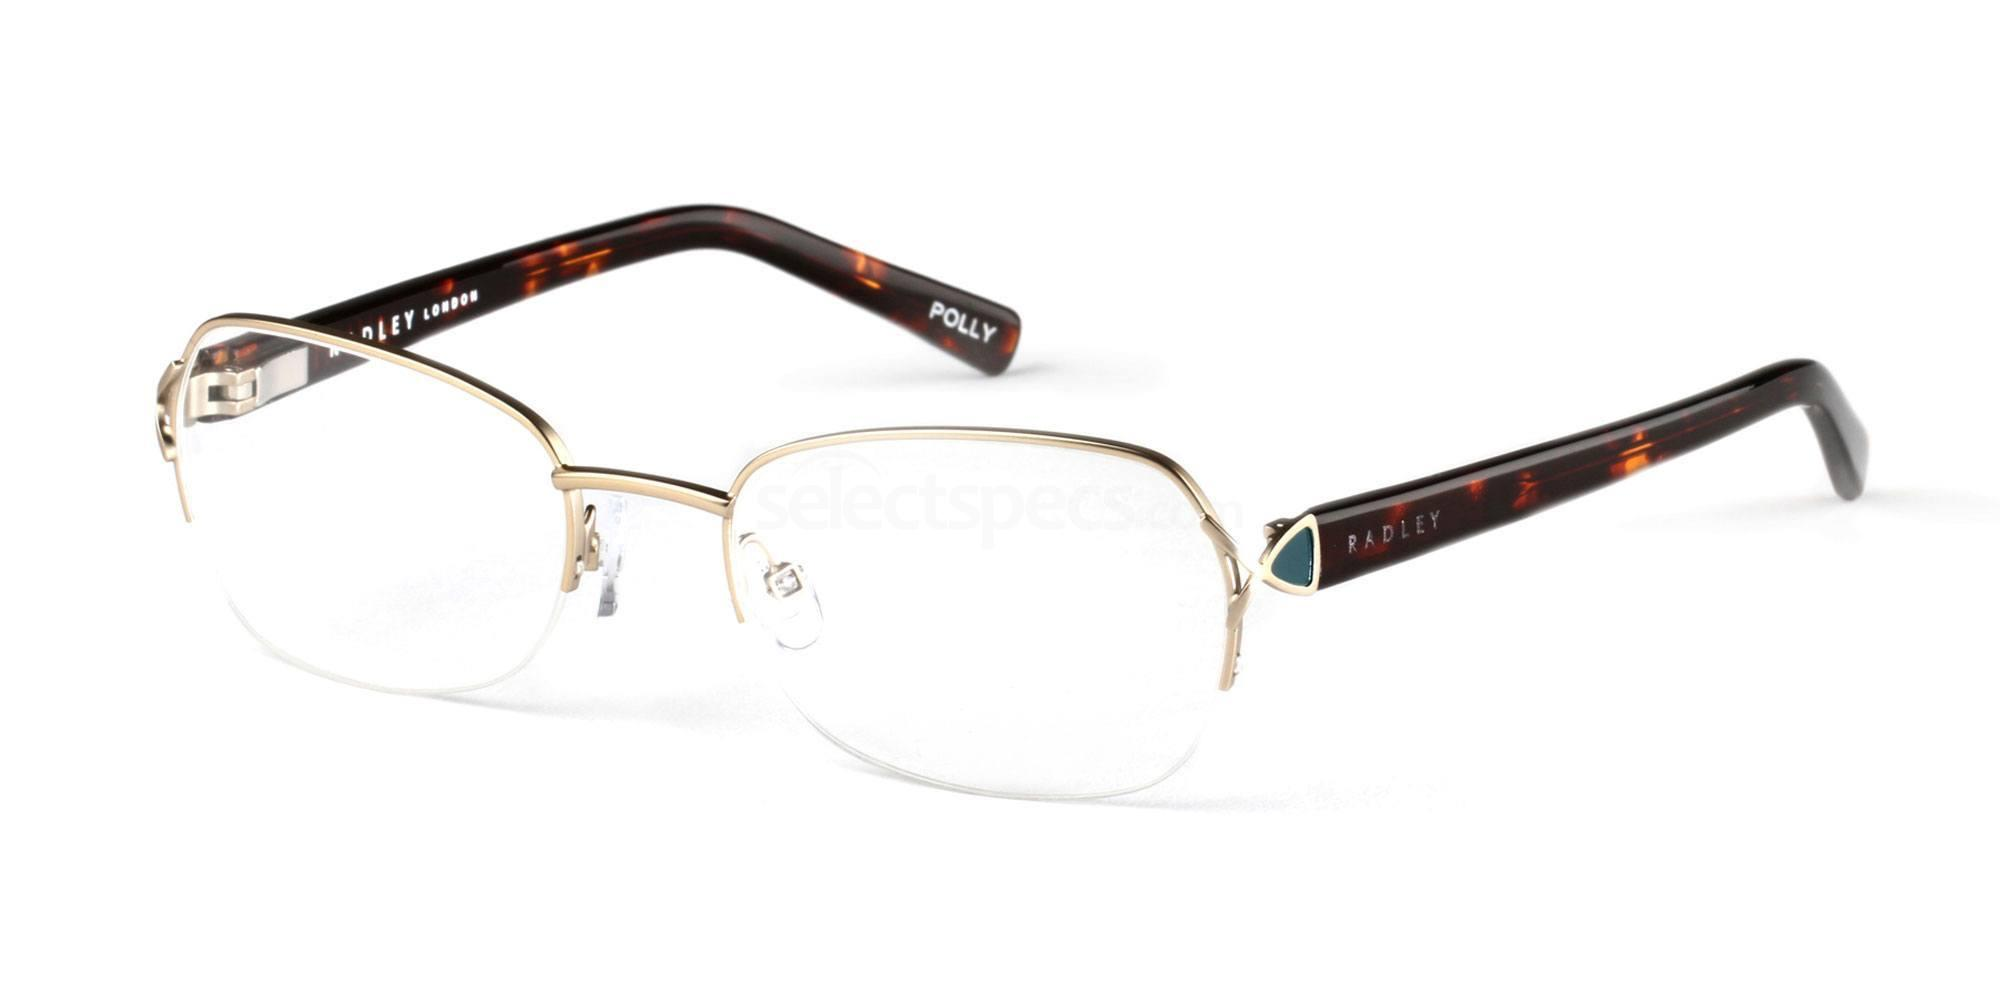 001 RDO-POLLY Glasses, Radley London